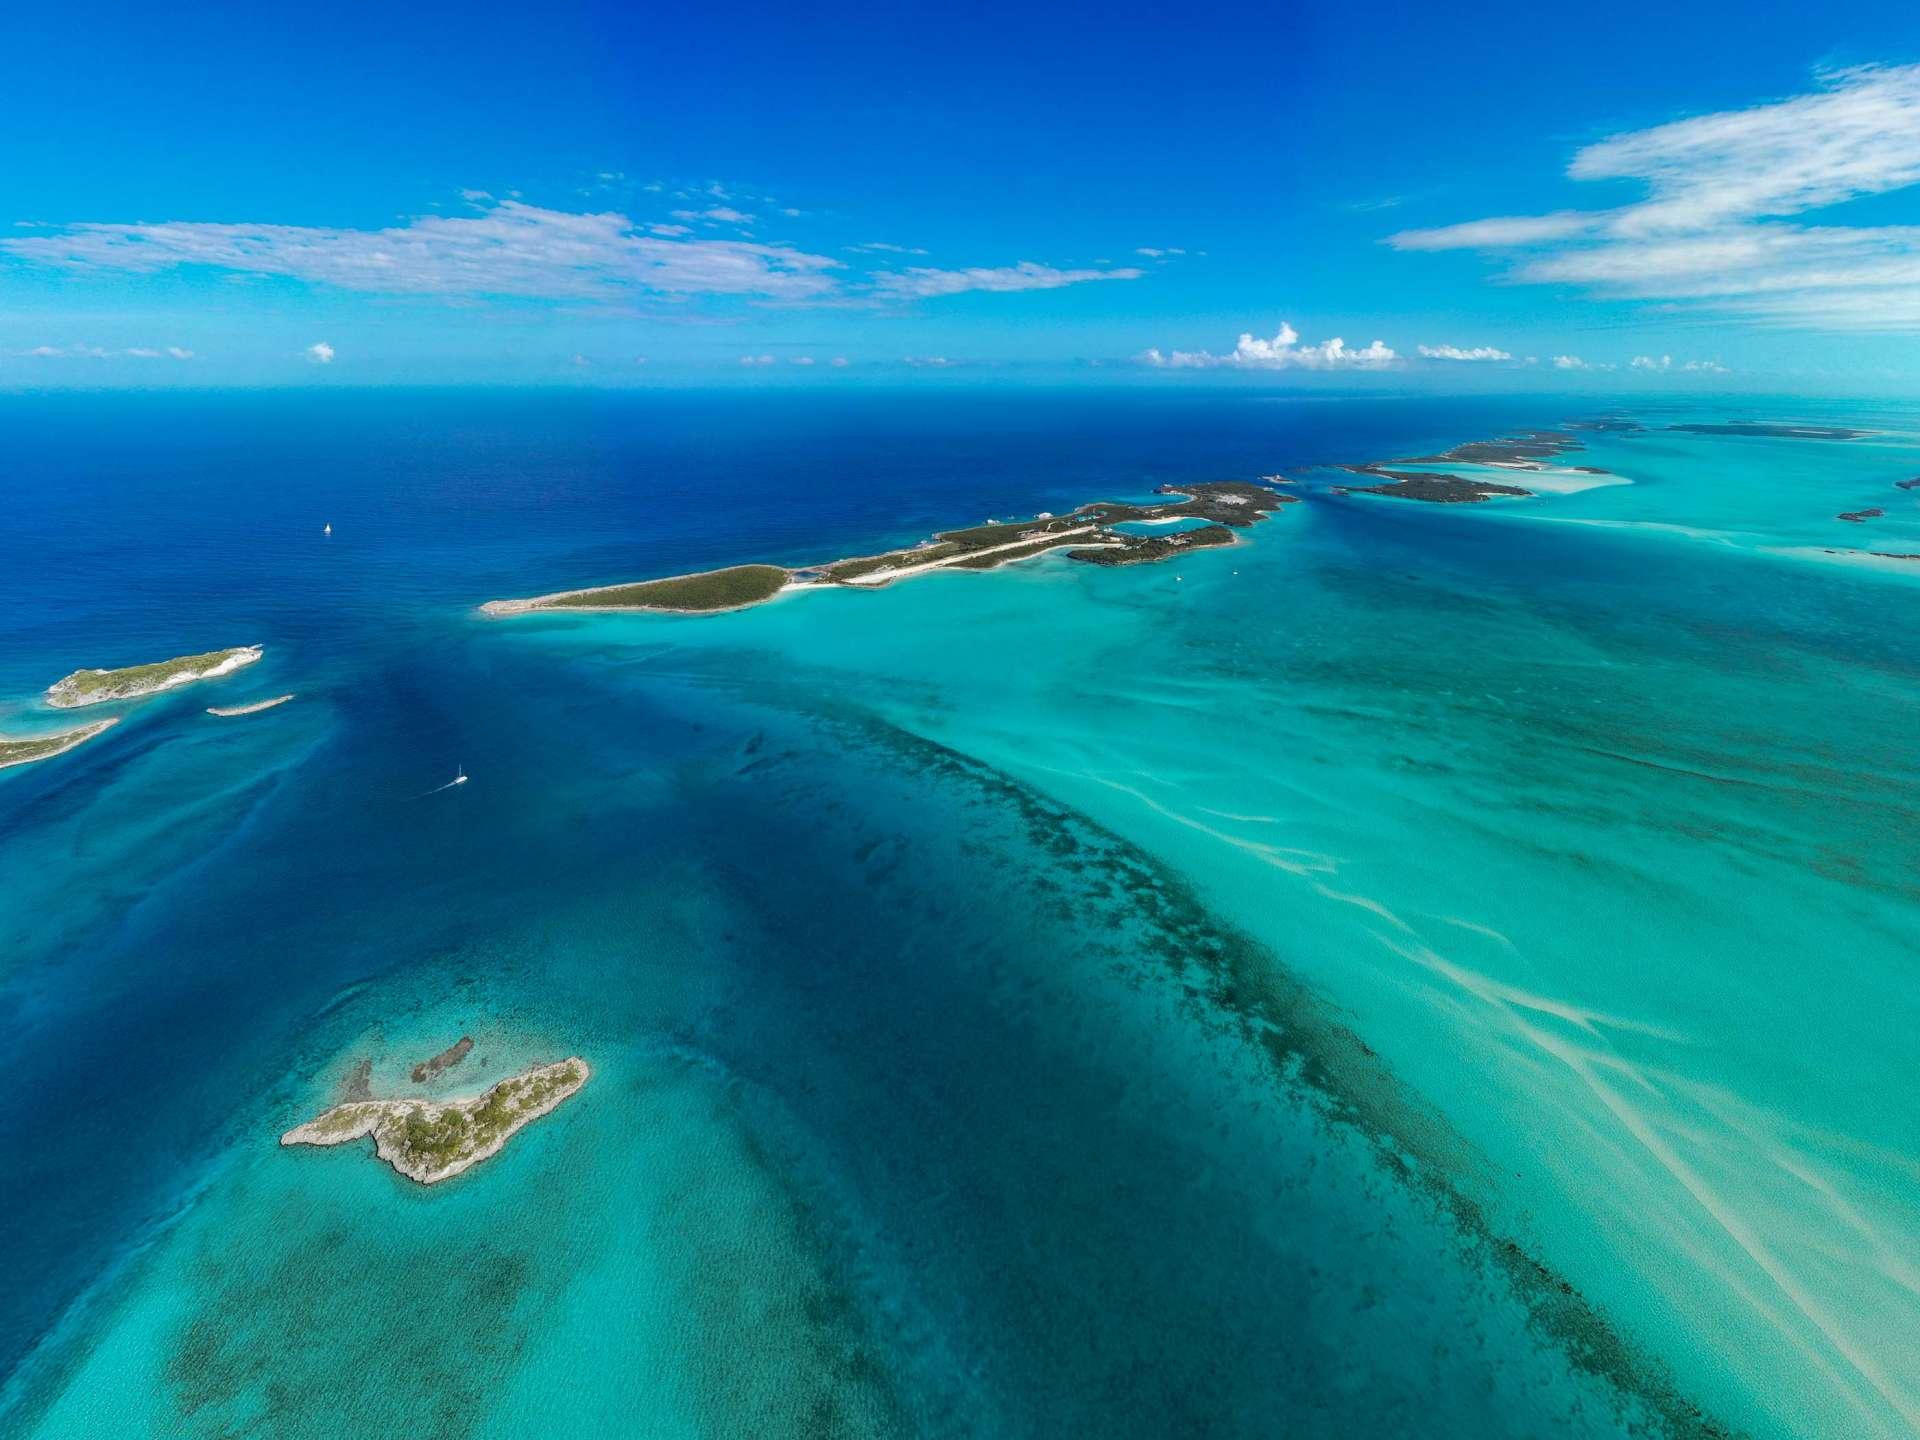 Exuma Cays Bahamas drone aerial view